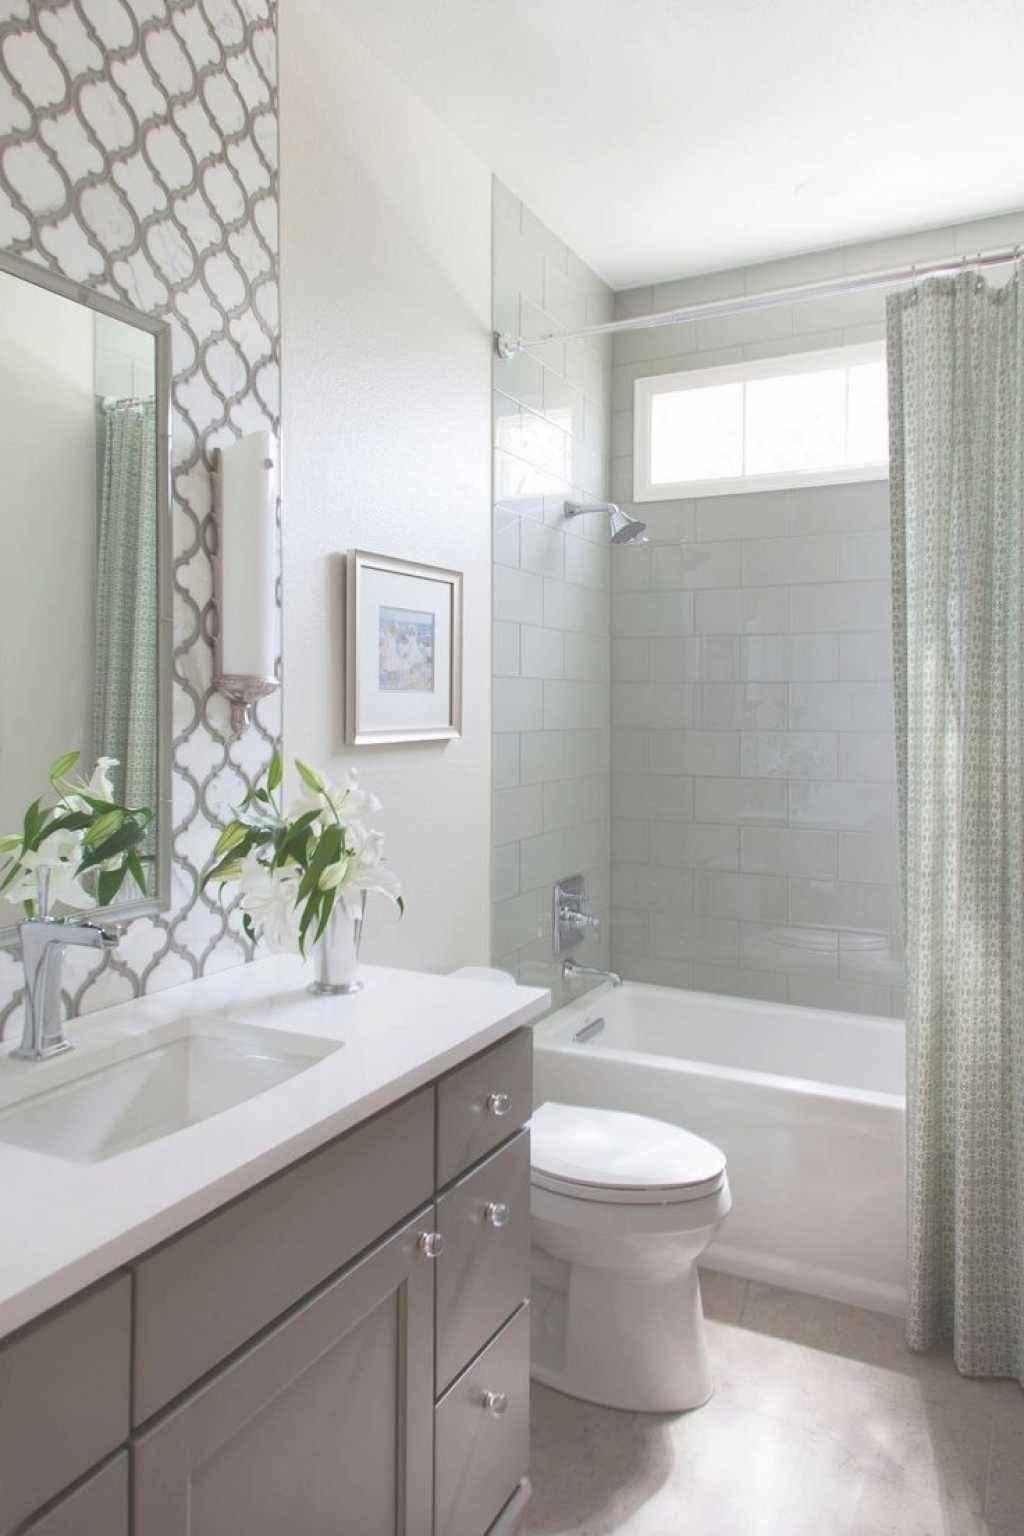 111 Brilliant Small Bathroom Remodel Ideas On A Budget (1)